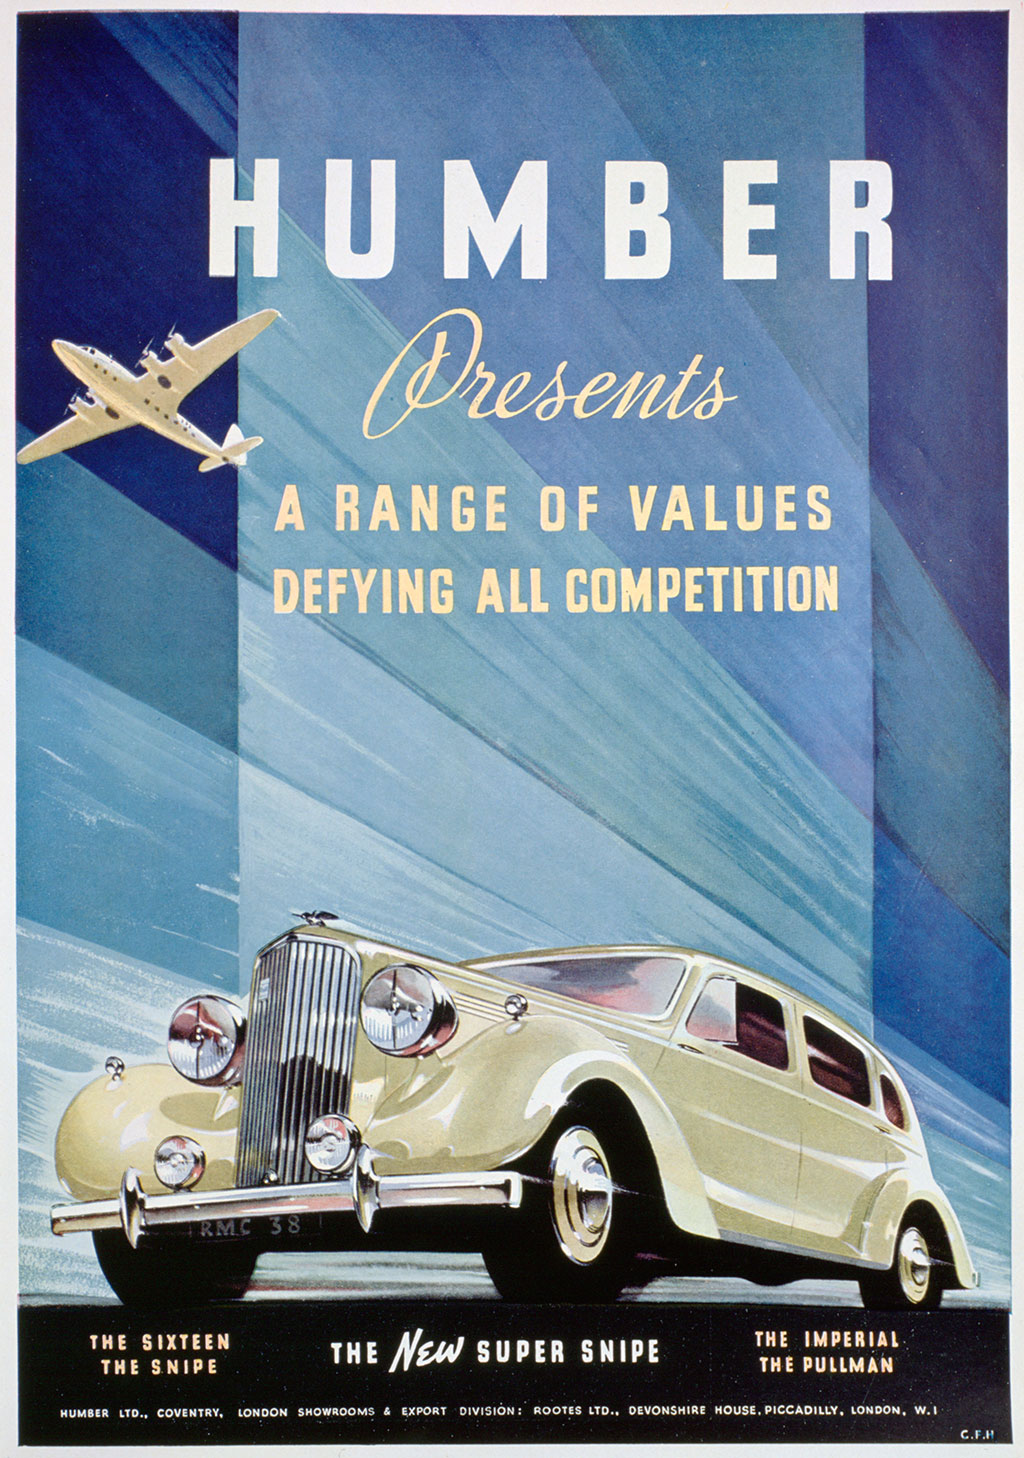 Humber-Motor-Cars